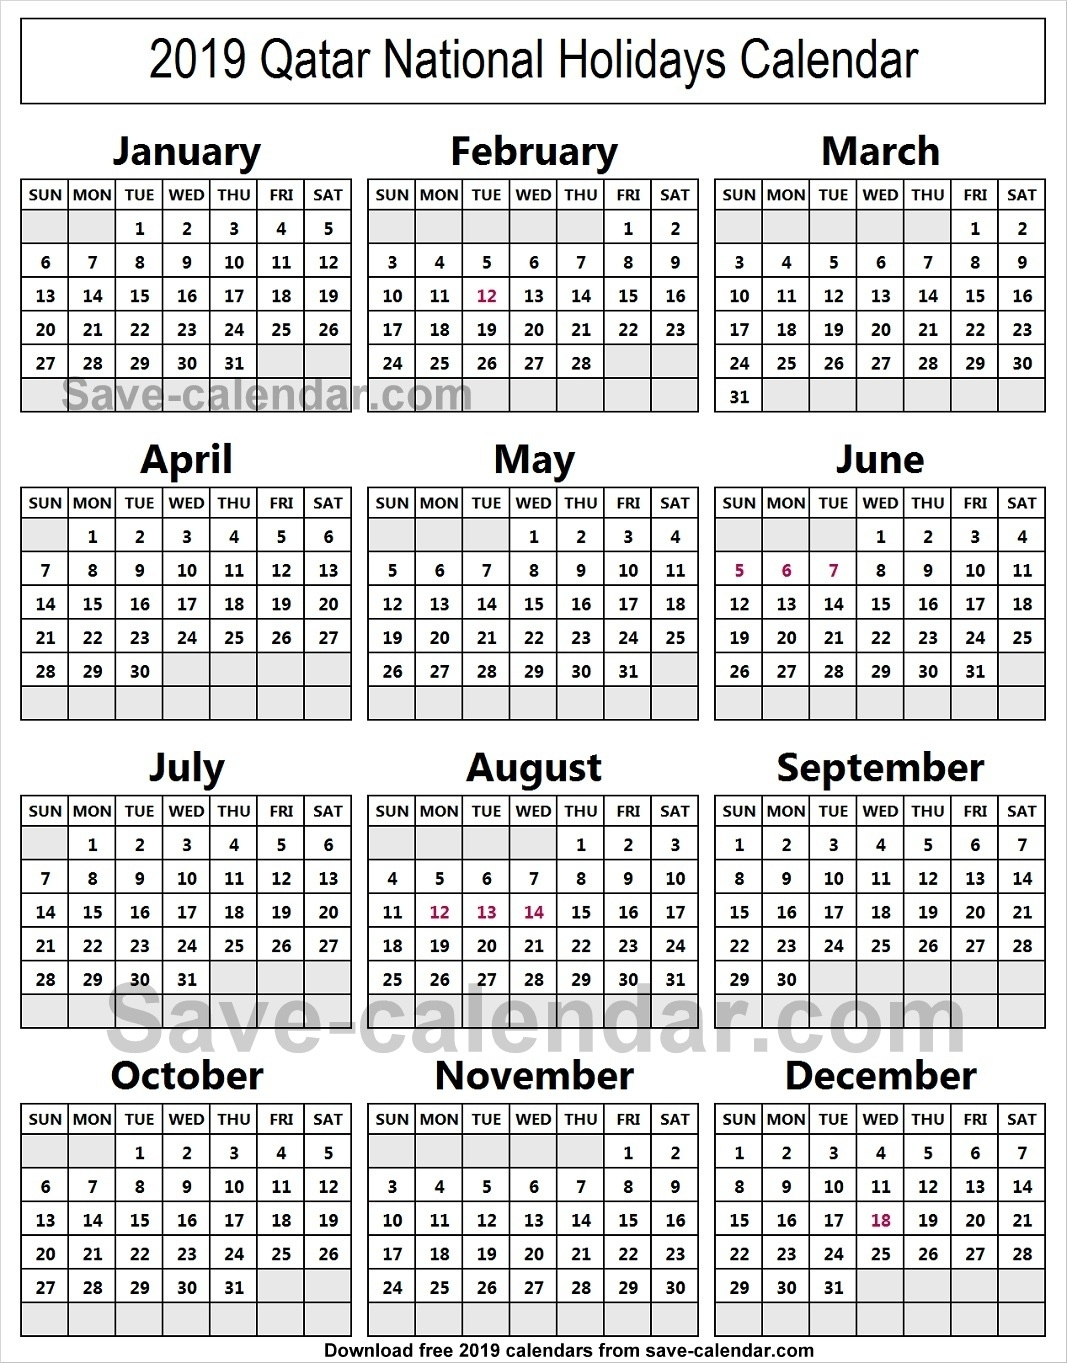 Calendar 2019 Holidays Qatar • Printable Blank Calendar Template with School Year Calendar 2019-2020 Michael E. Debakey High